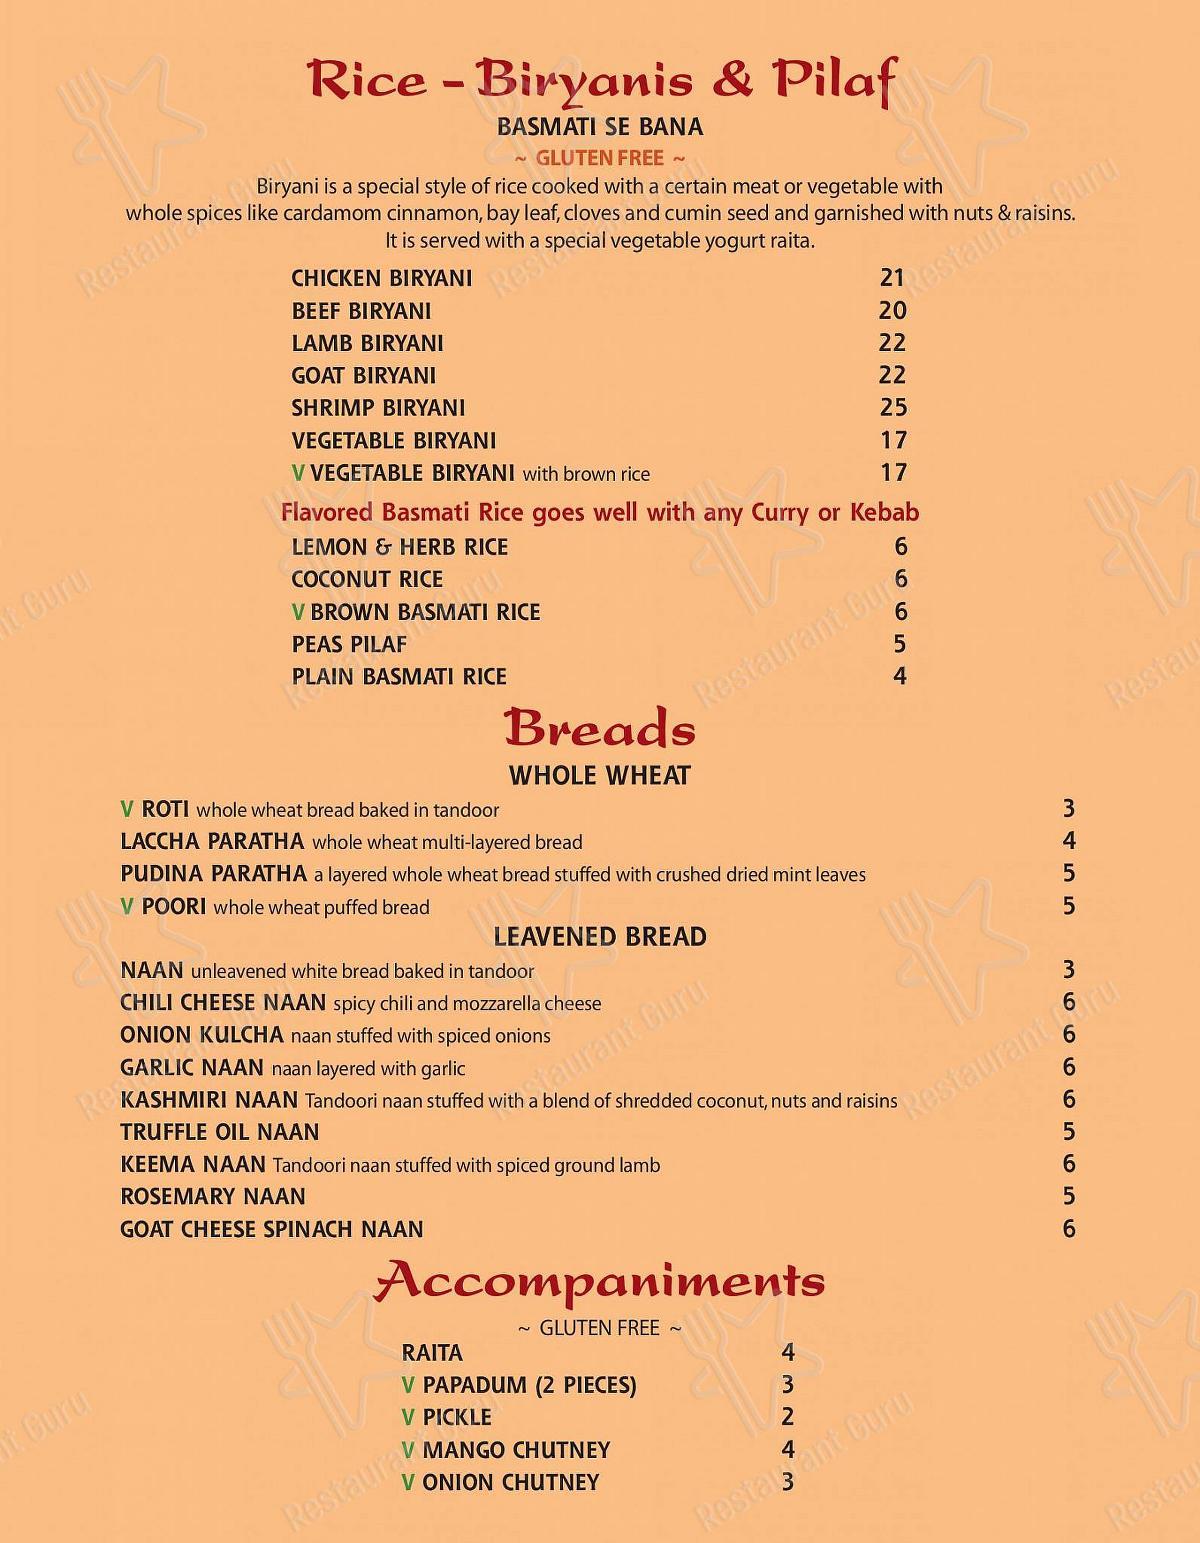 Saaz menu - dishes and beverages